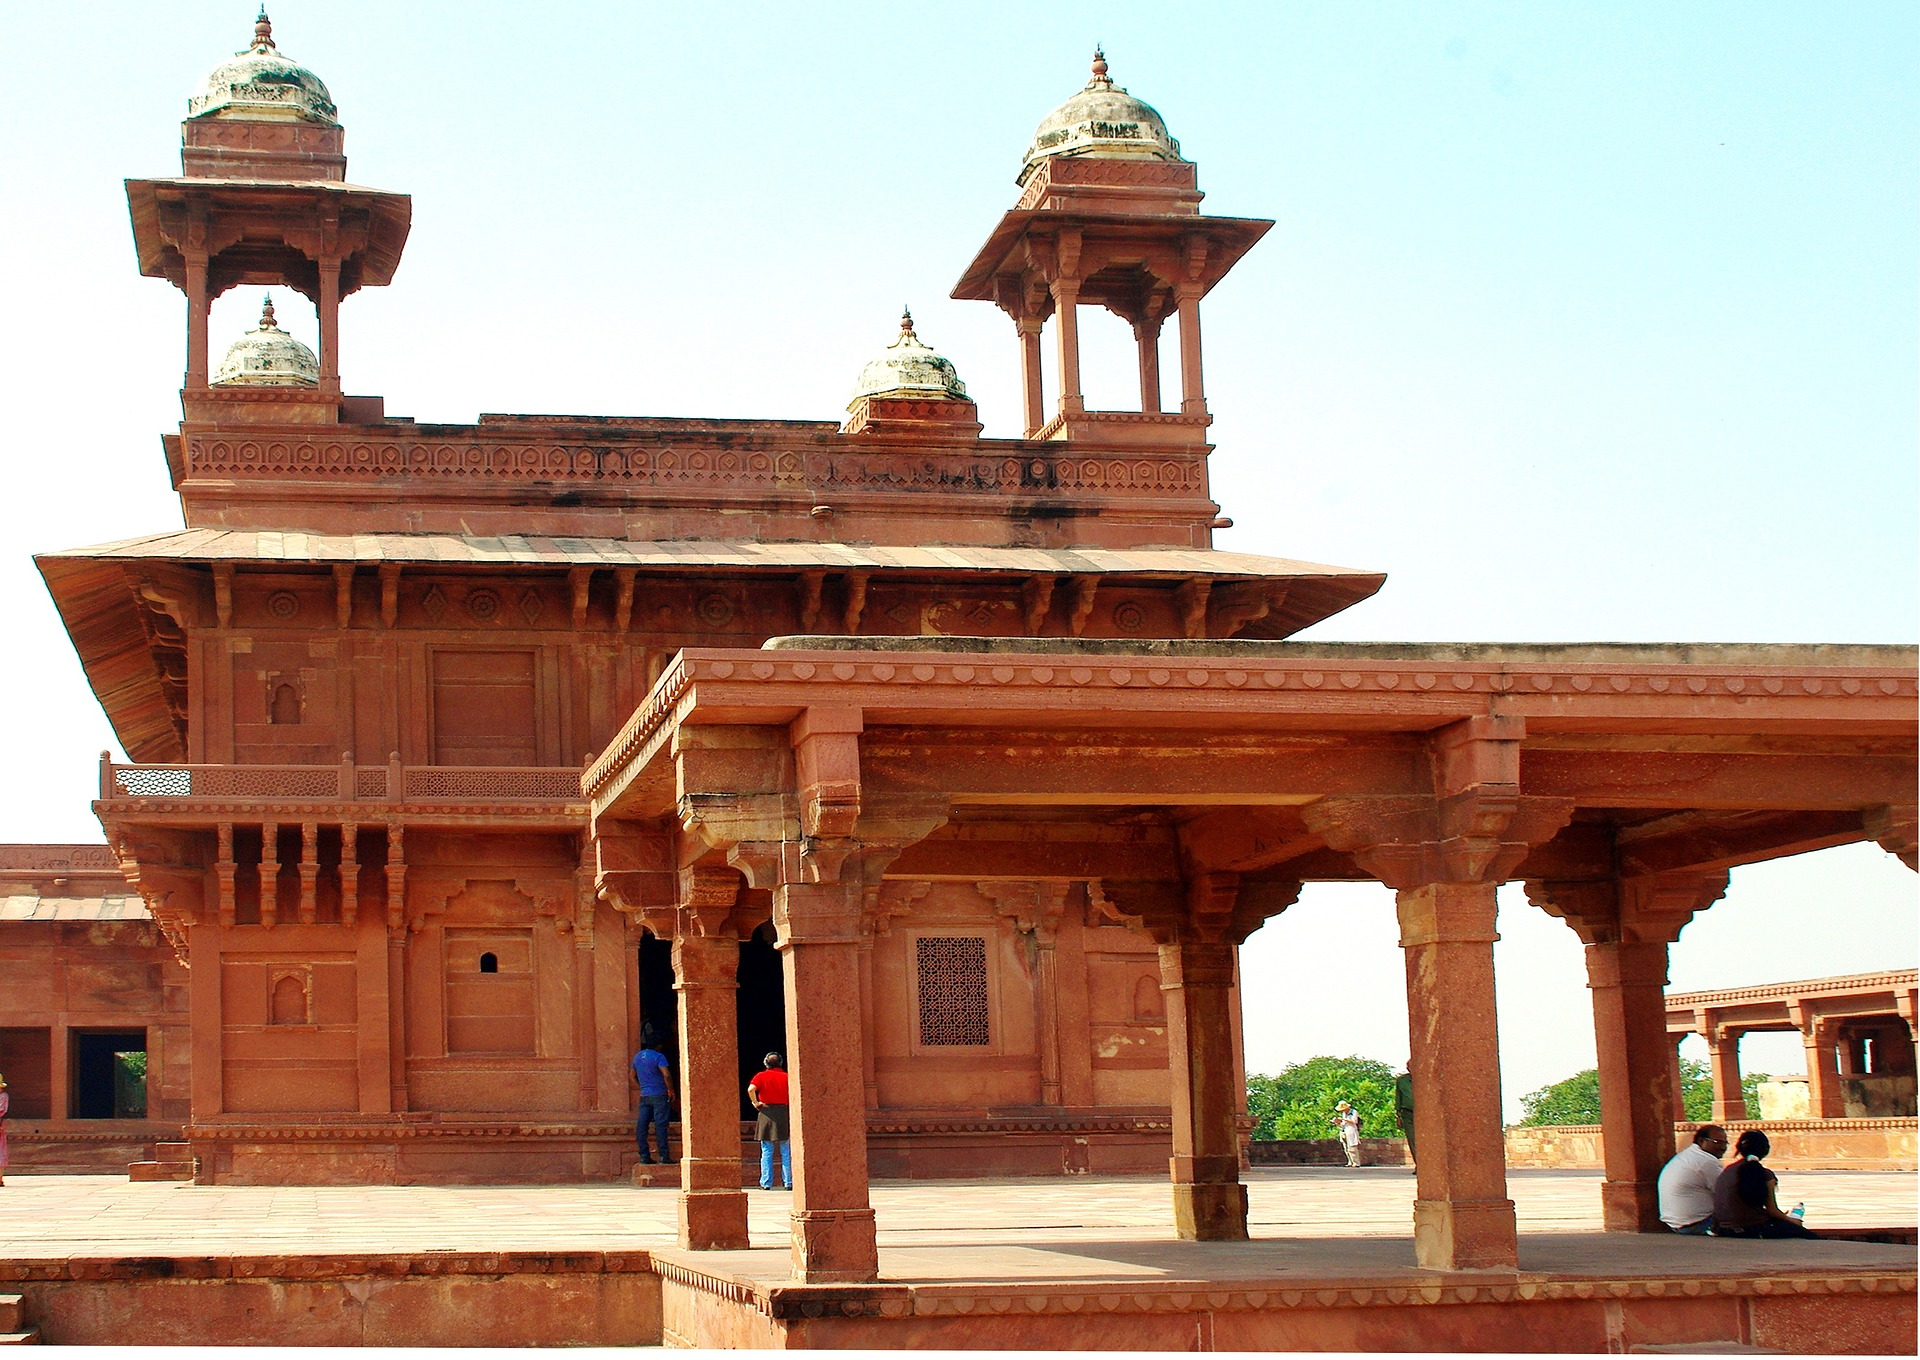 Agra Indien - Denkmal